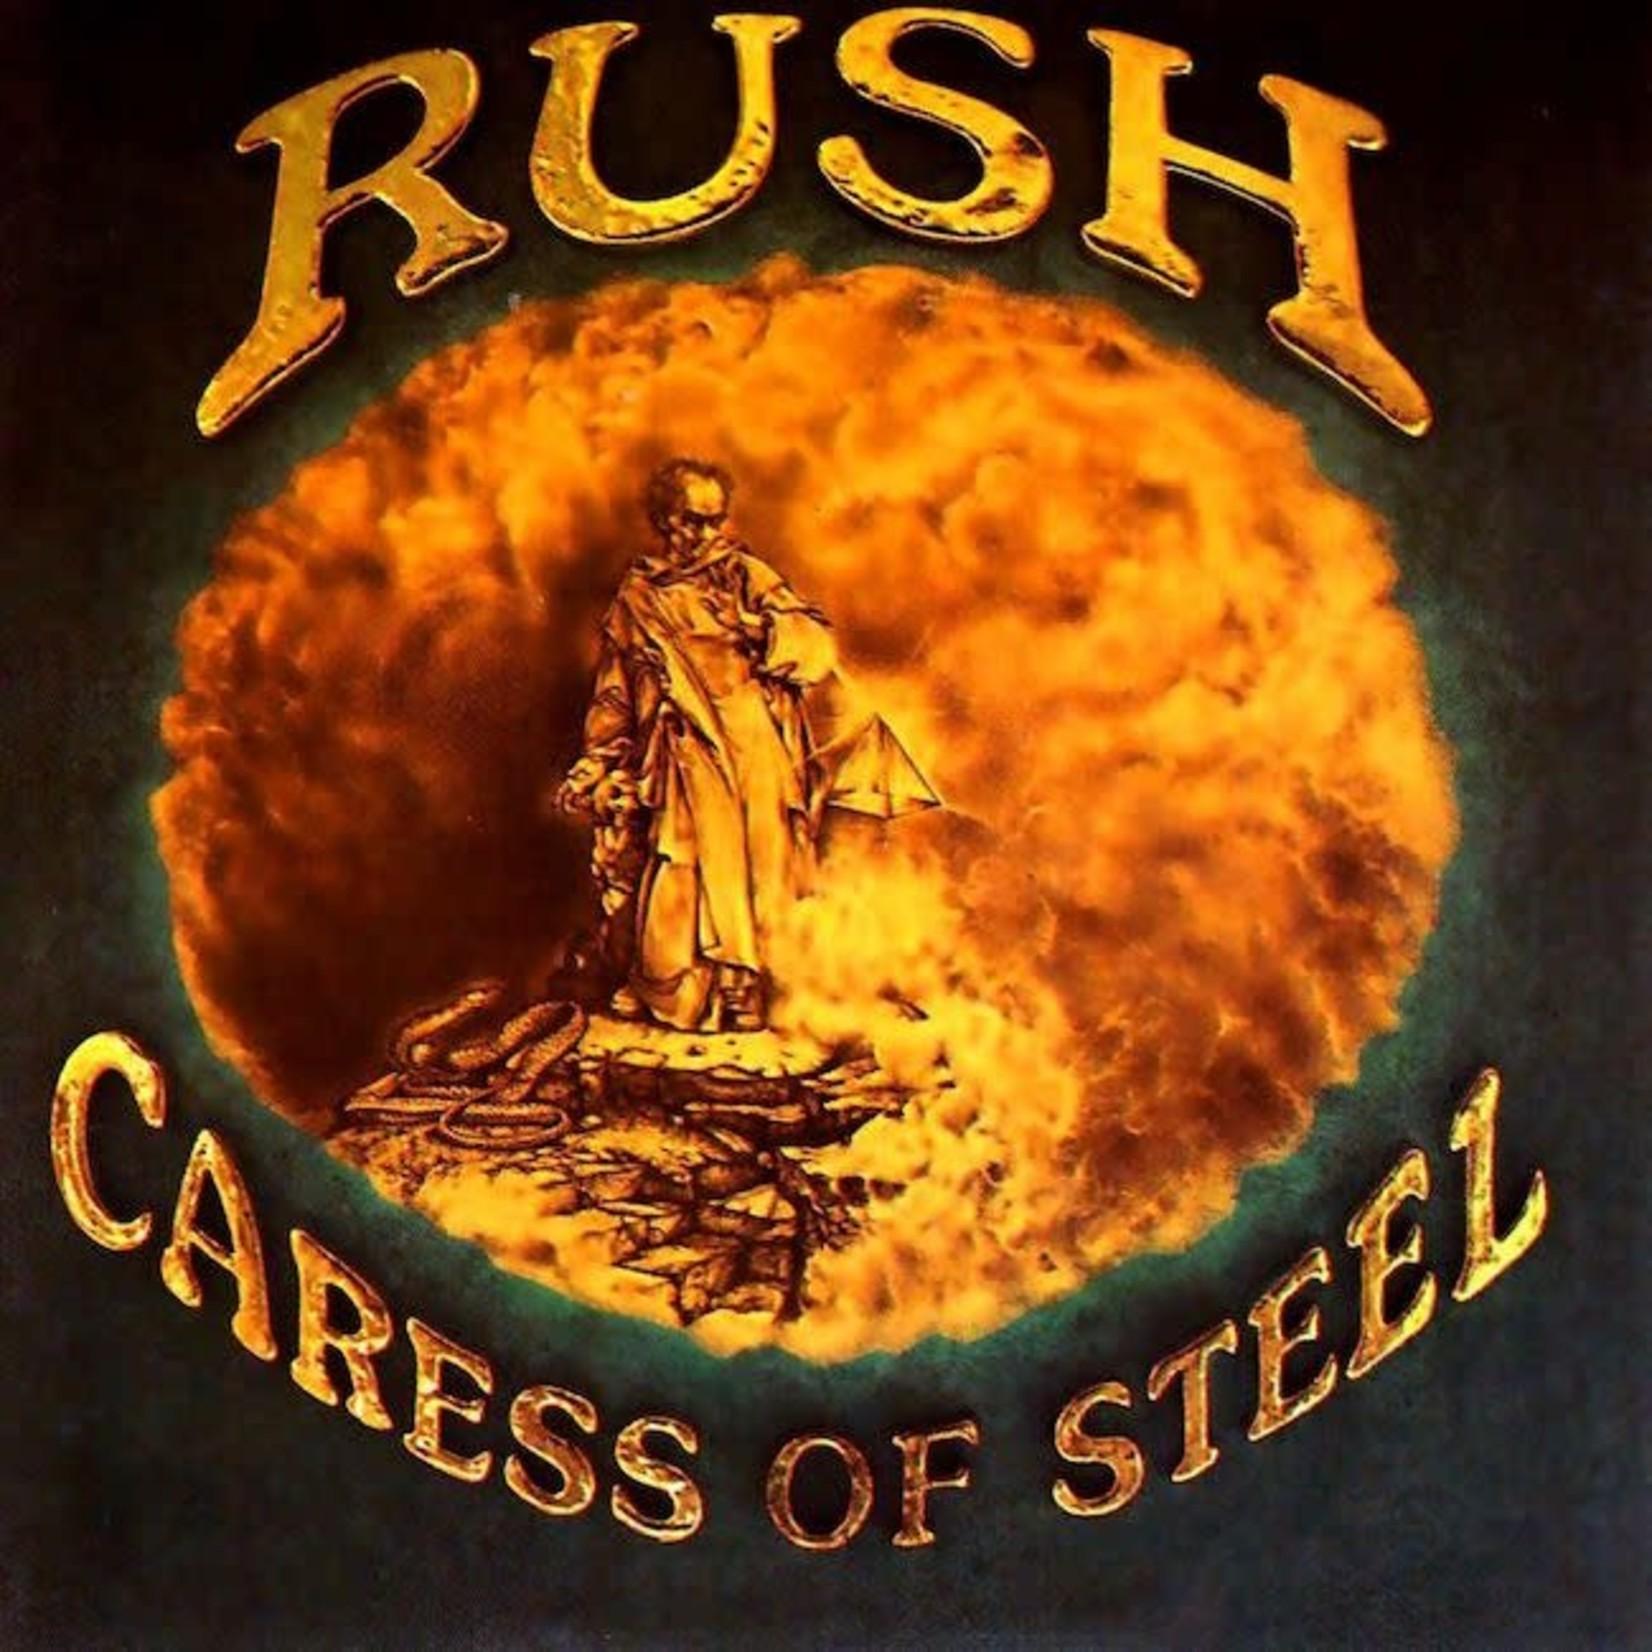 [Vintage] Rush: Caress of Steel